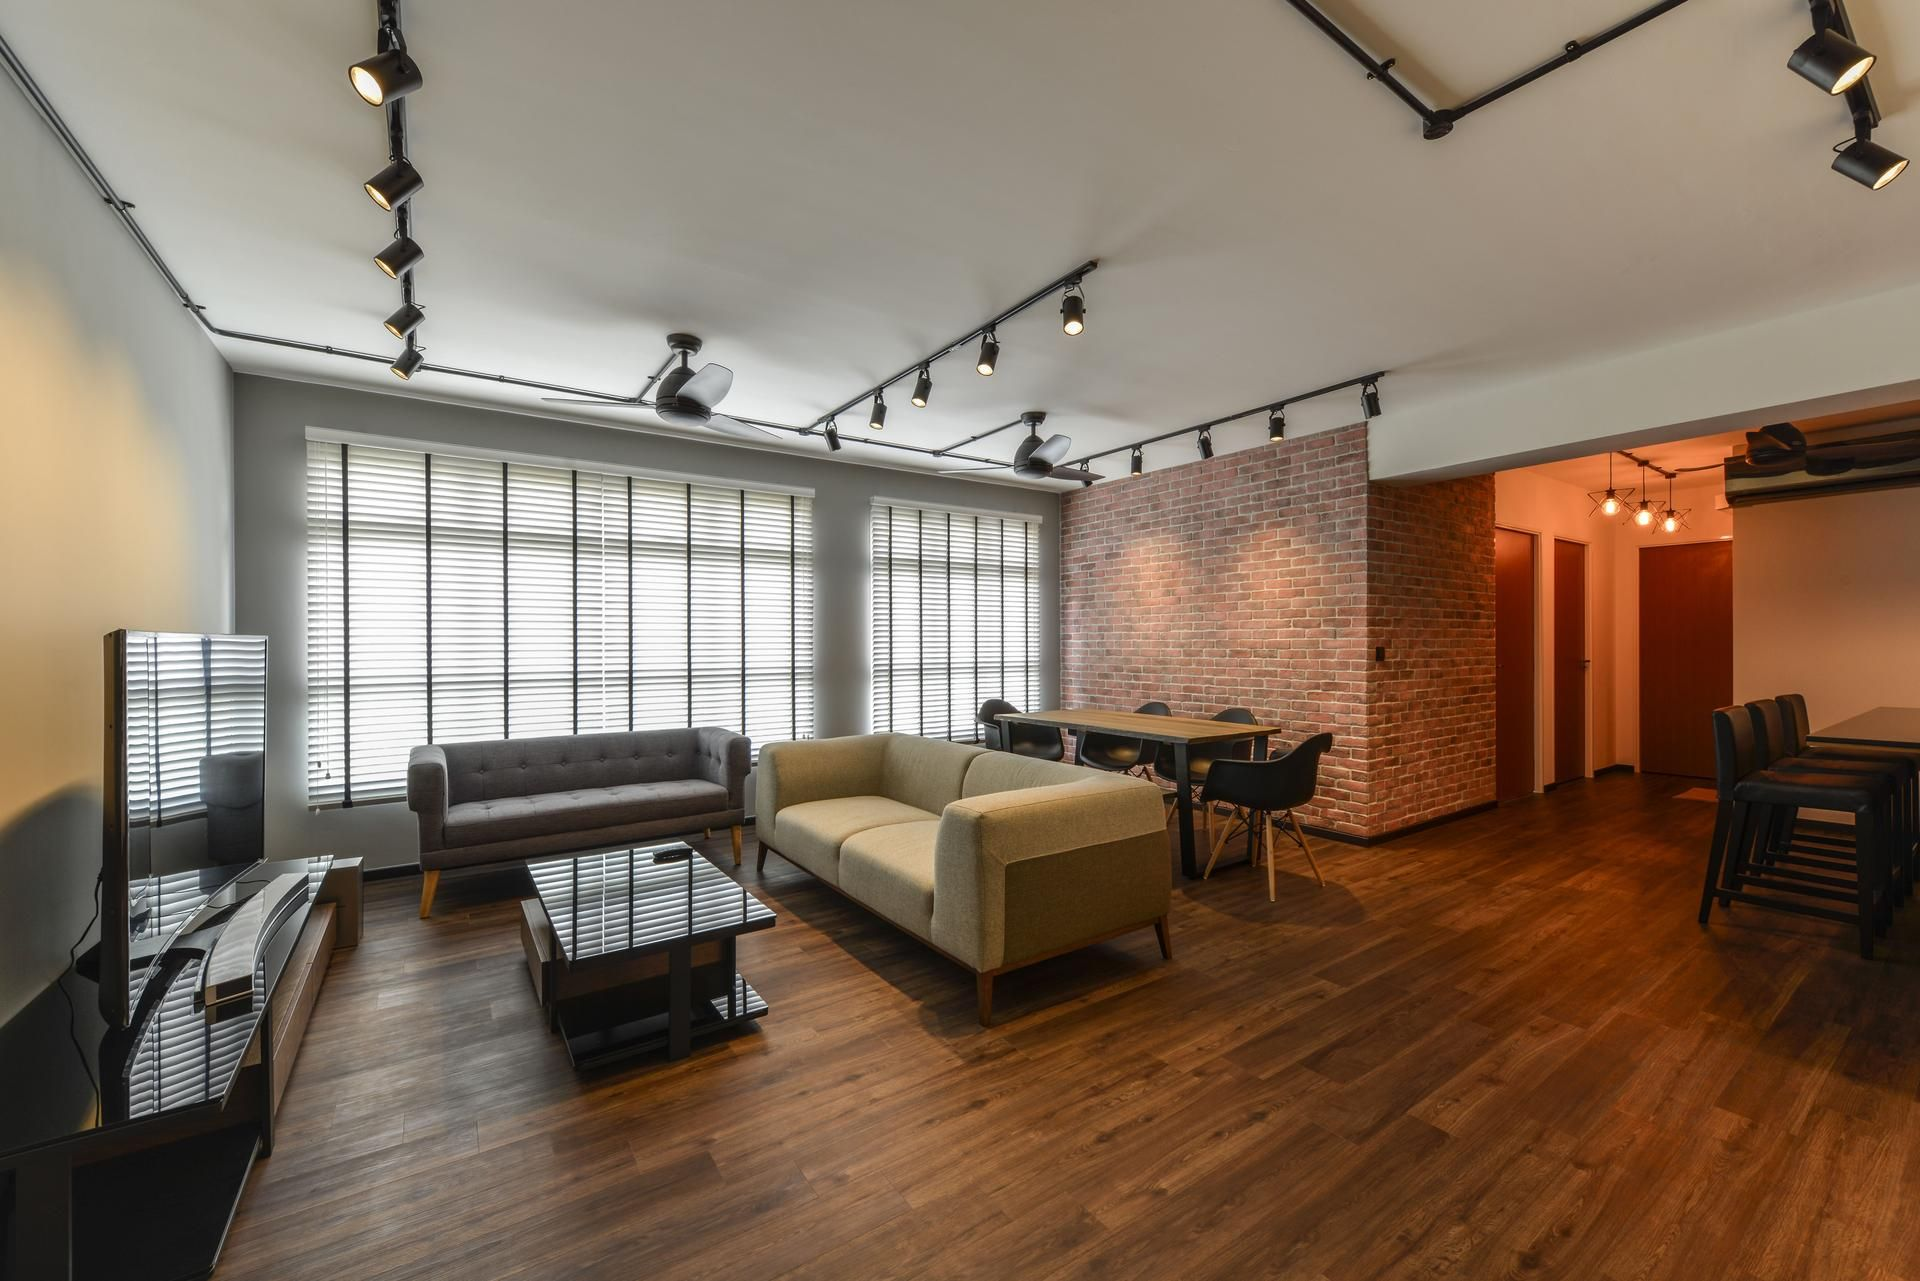 Keat Hong Axis | Qanvast | Home Design, Renovation ...